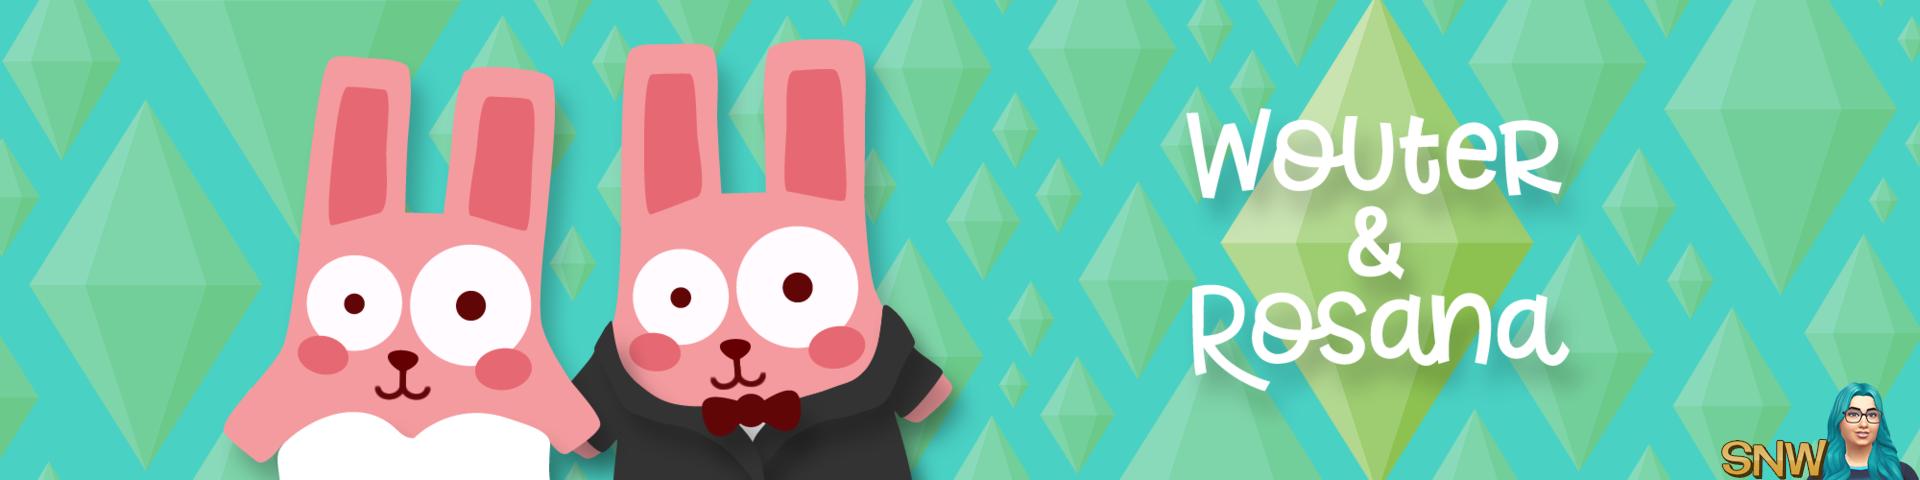 wedding announcement Wouter (ChEeTaH) & Rosana Freezer Bunny plumbobs